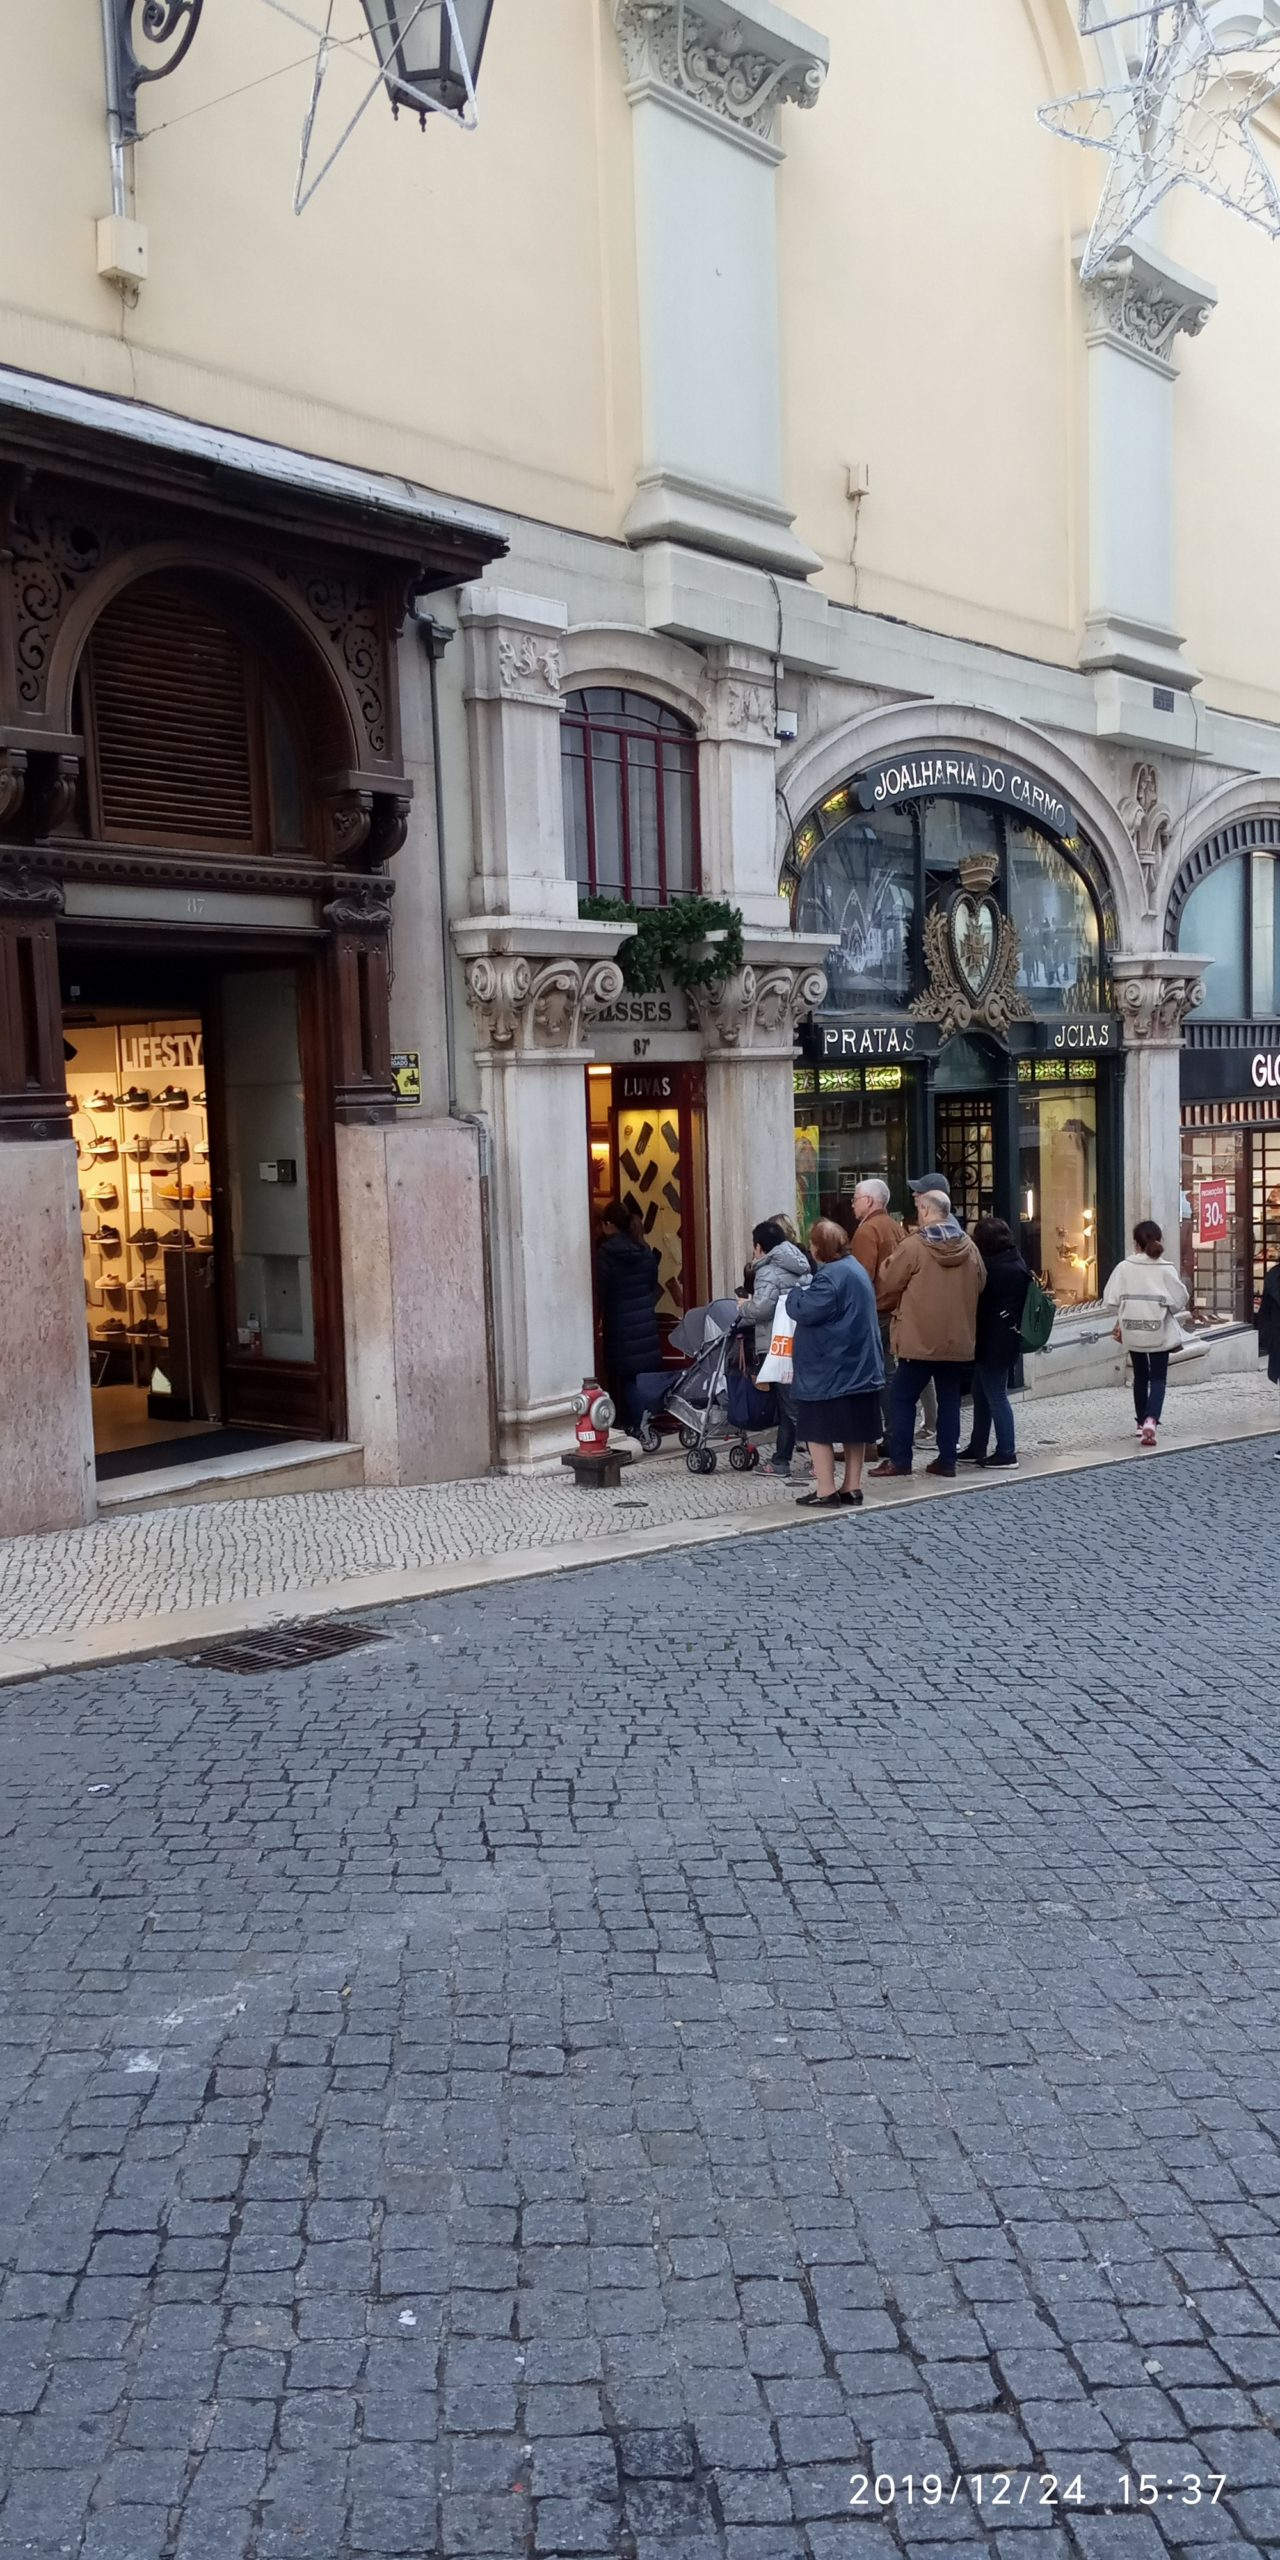 Лиссабонские заметки. Магазин перчаток.